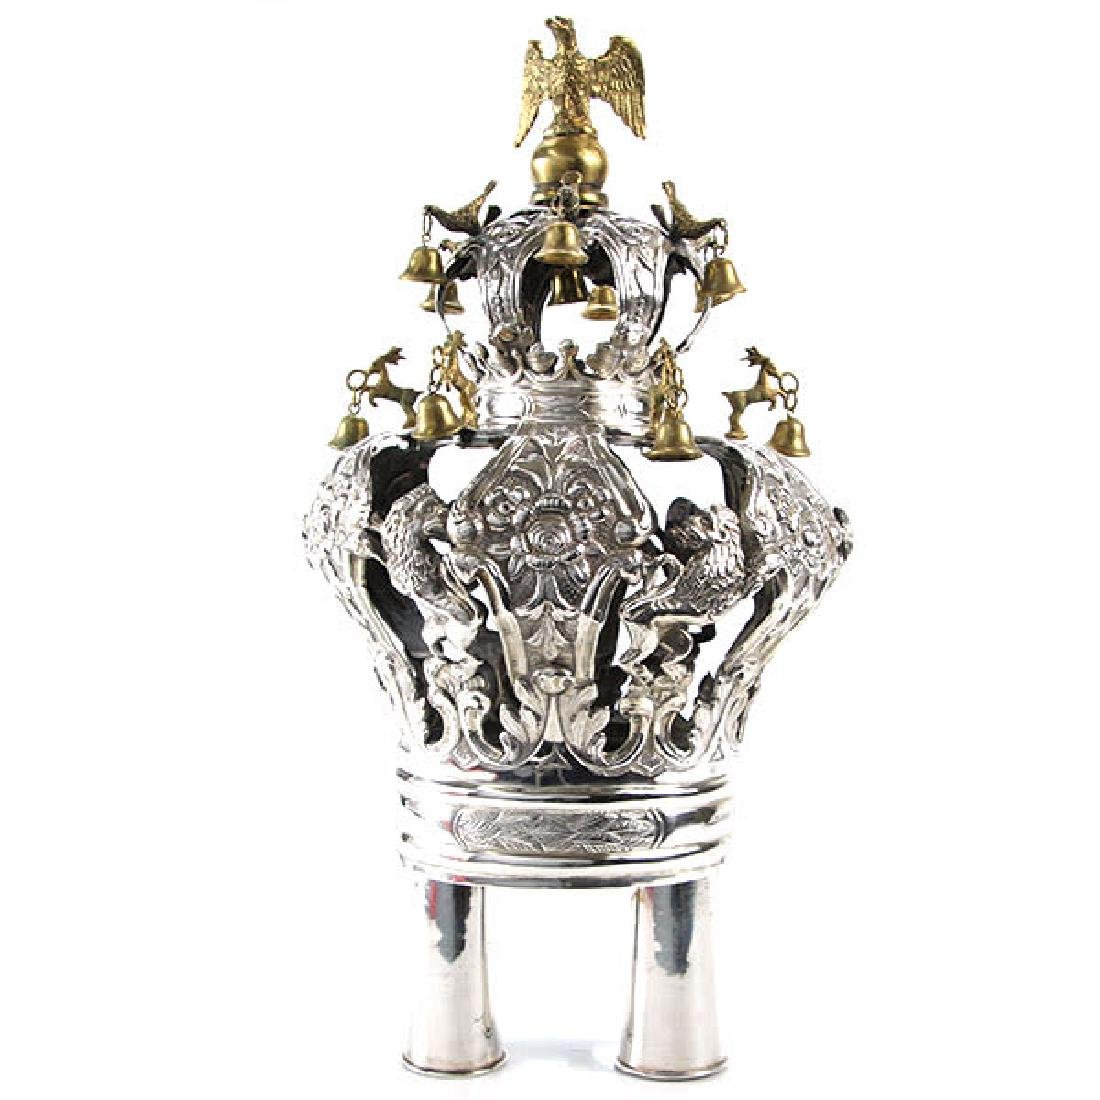 Silver Torah Crown, Moszek Charlap, Warsaw, Poland,